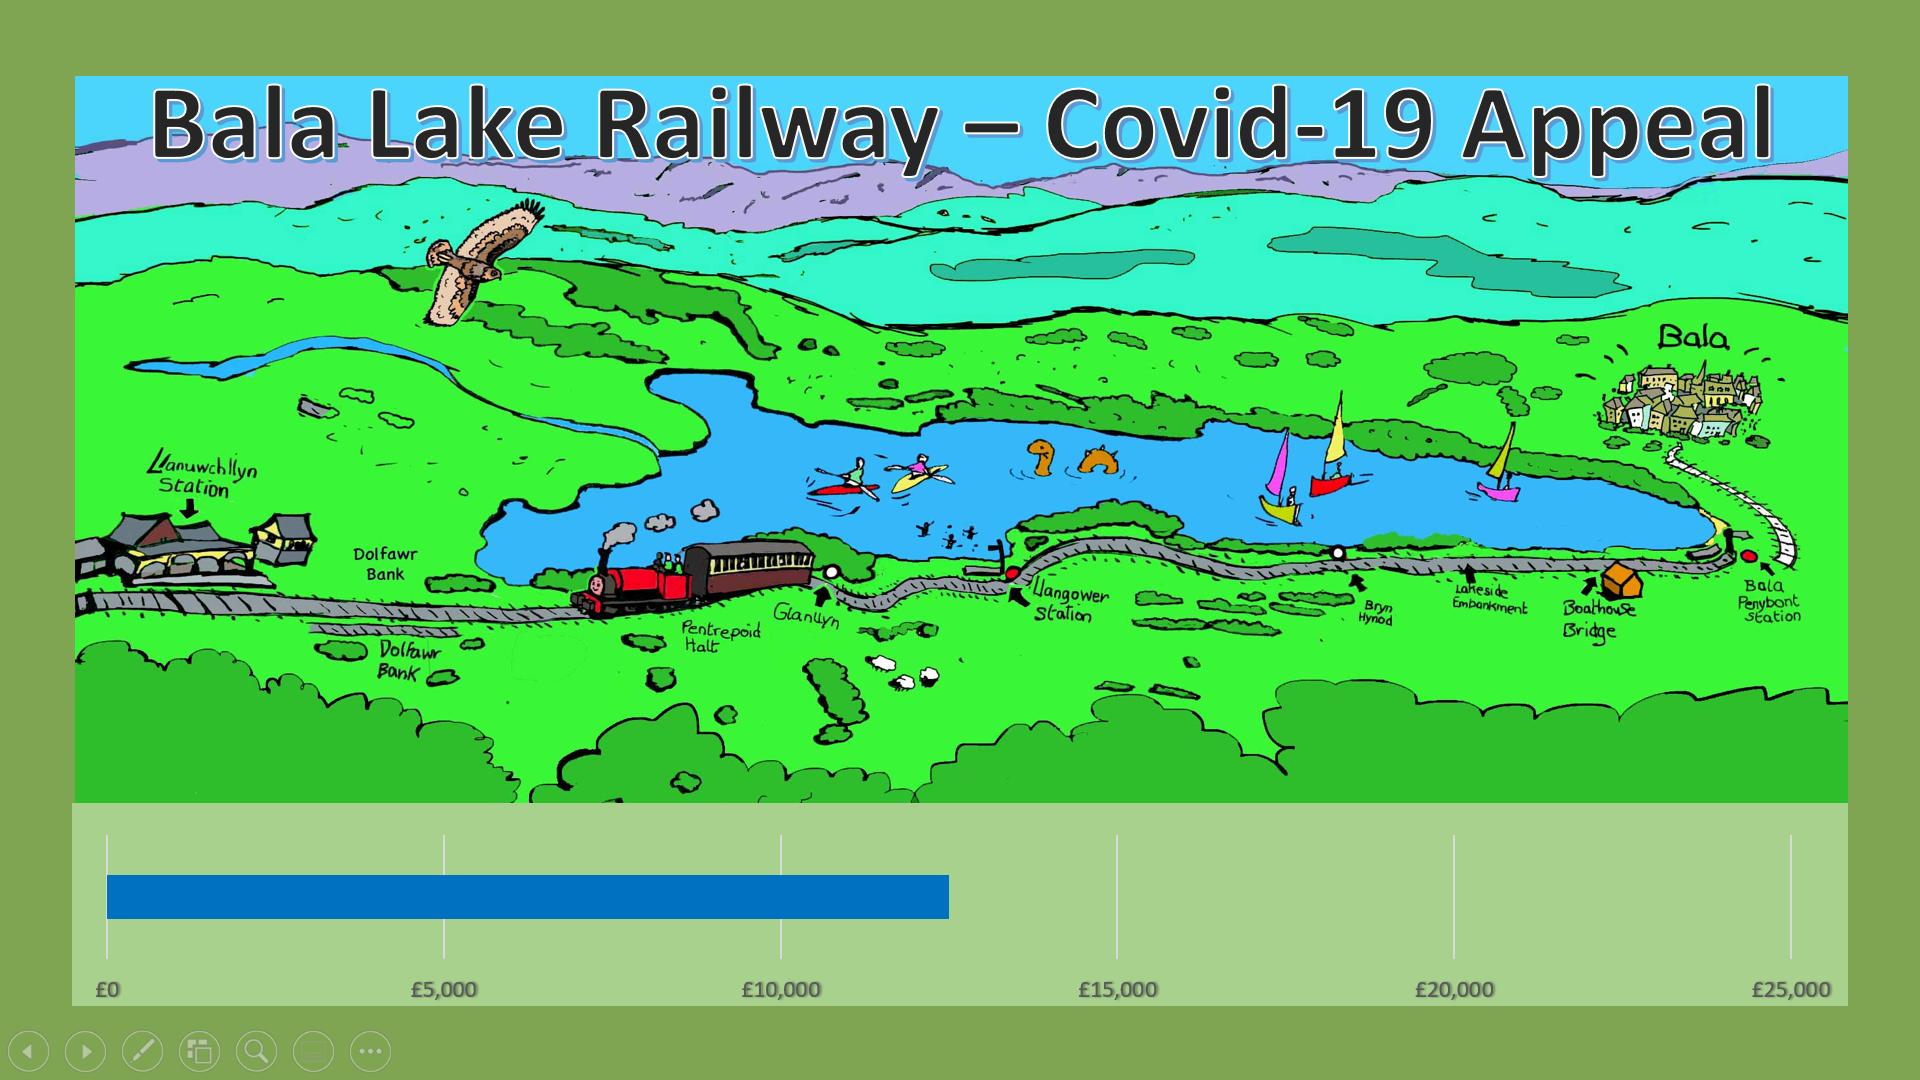 Appeal progress chart at £12500